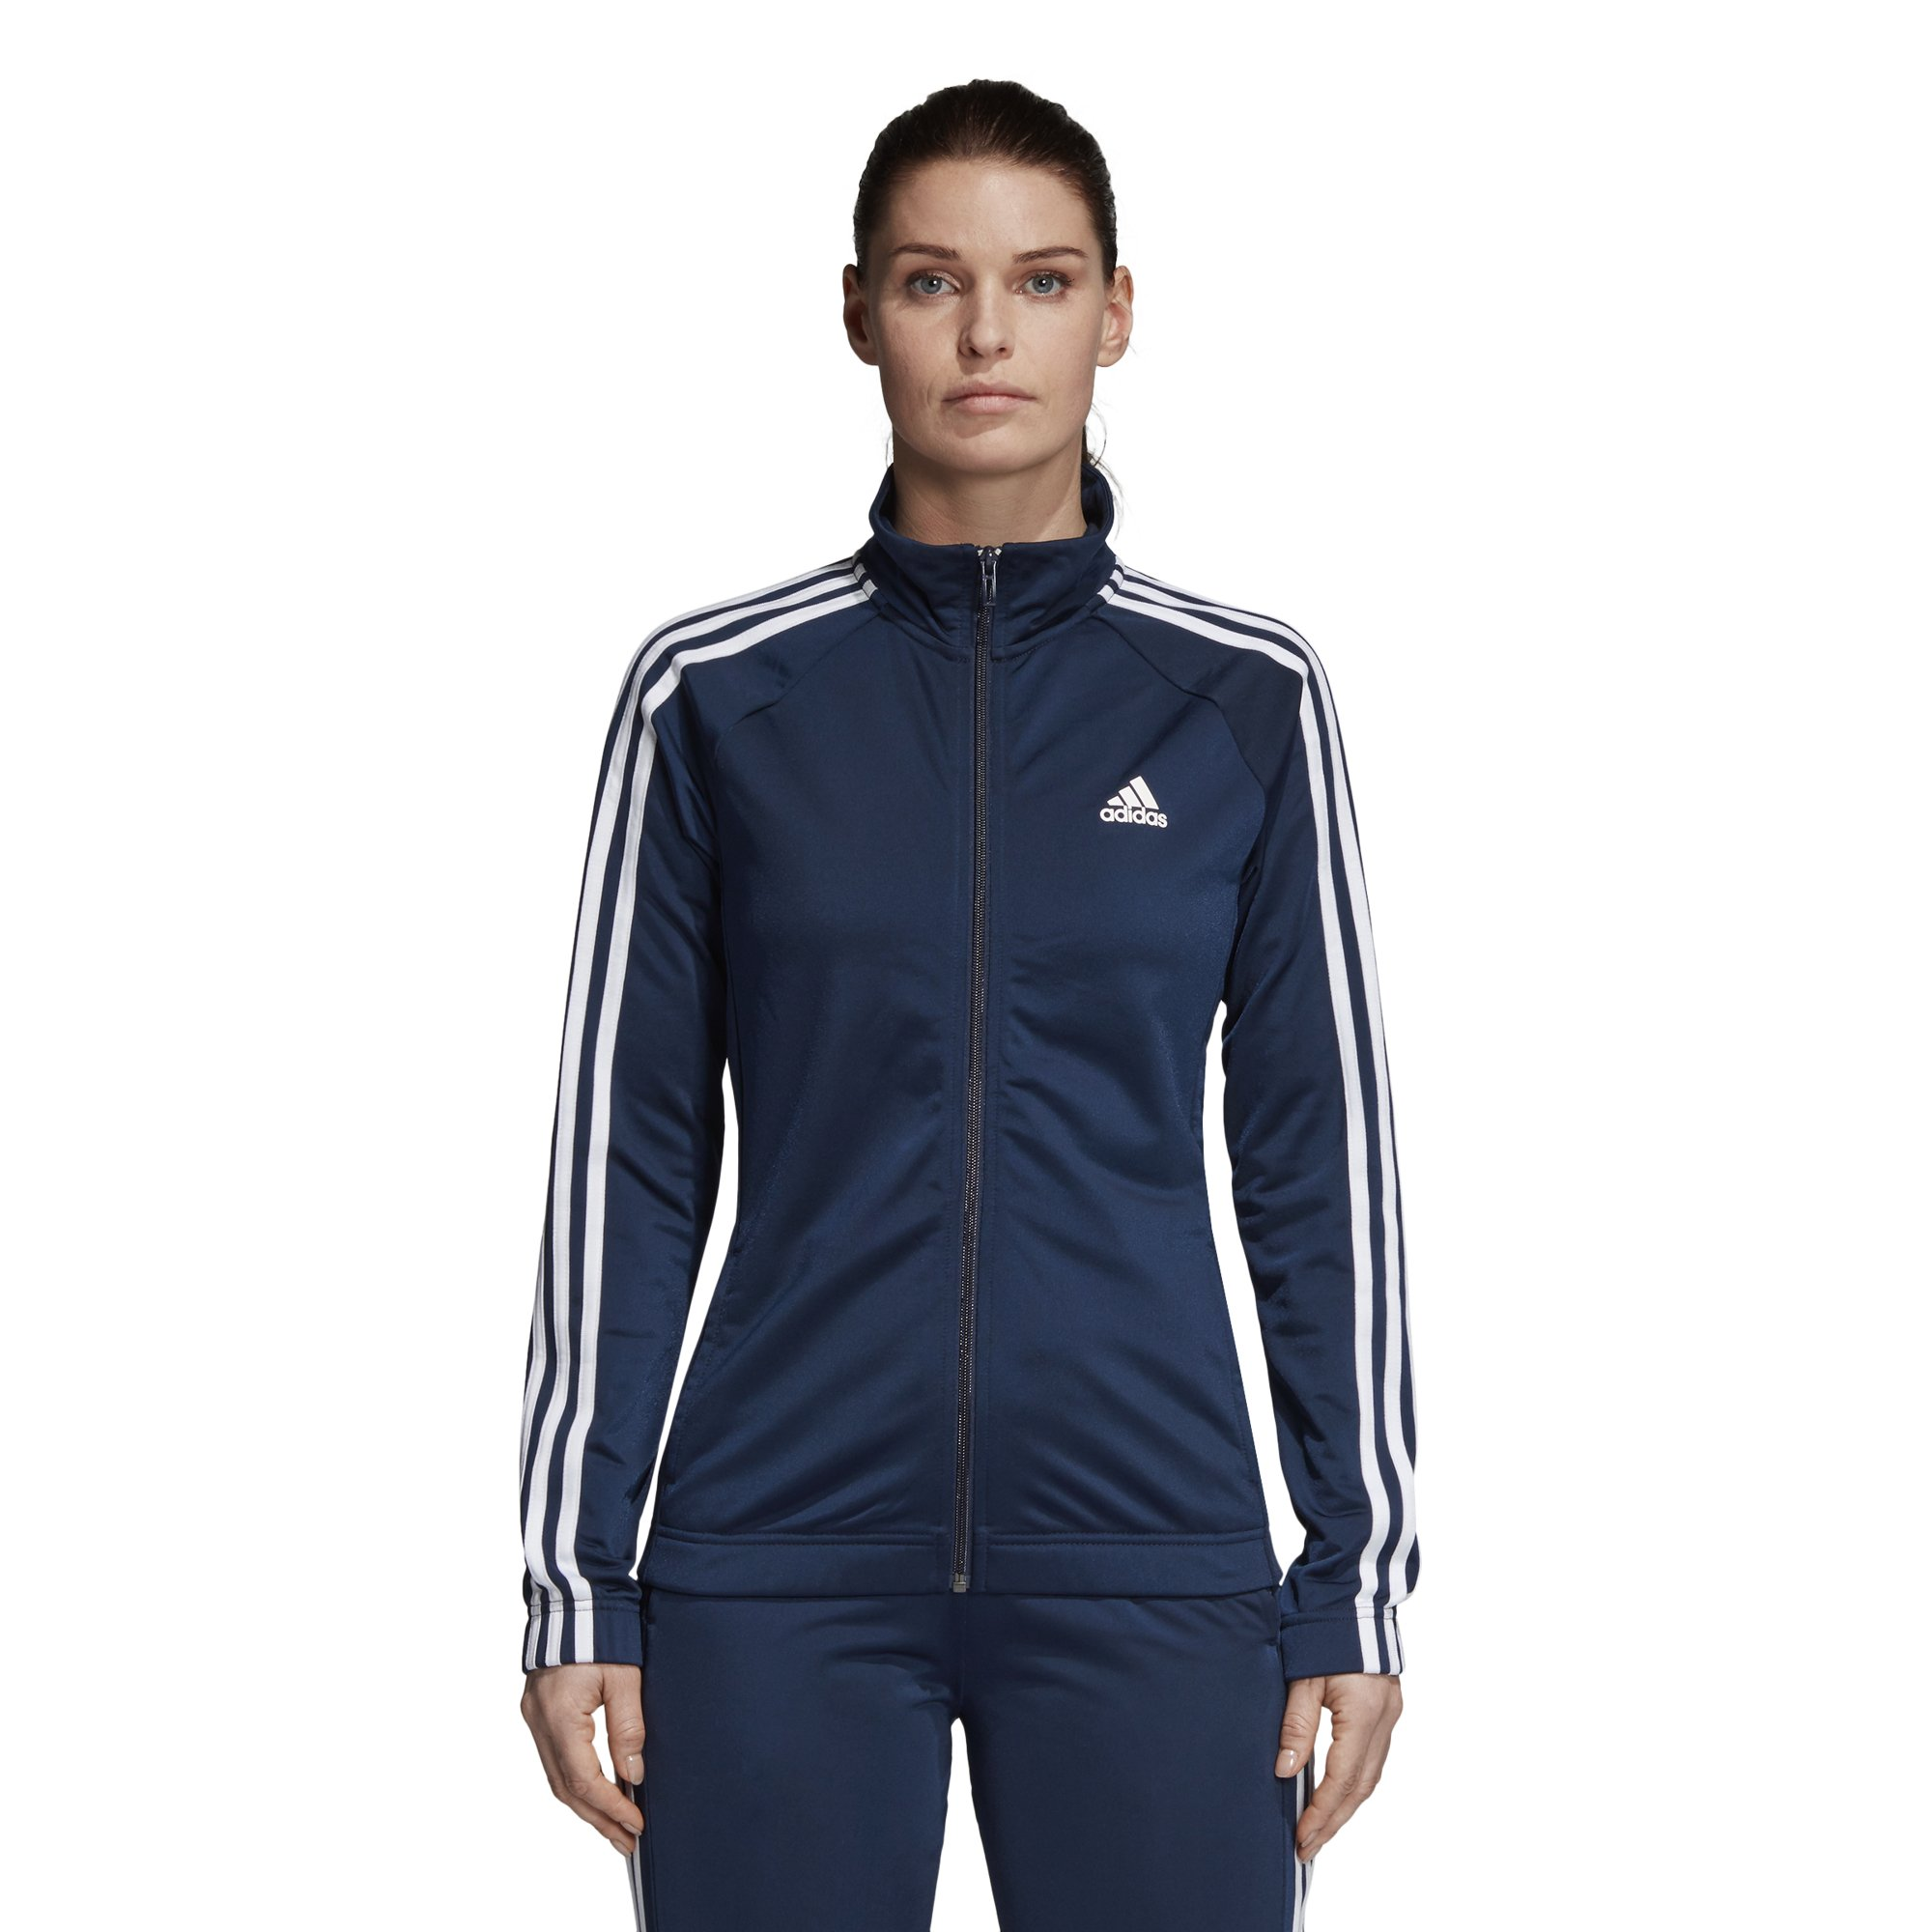 adidas Women's Designed-2-Move Track Jacket, Collegiate Navy/White, X-Small